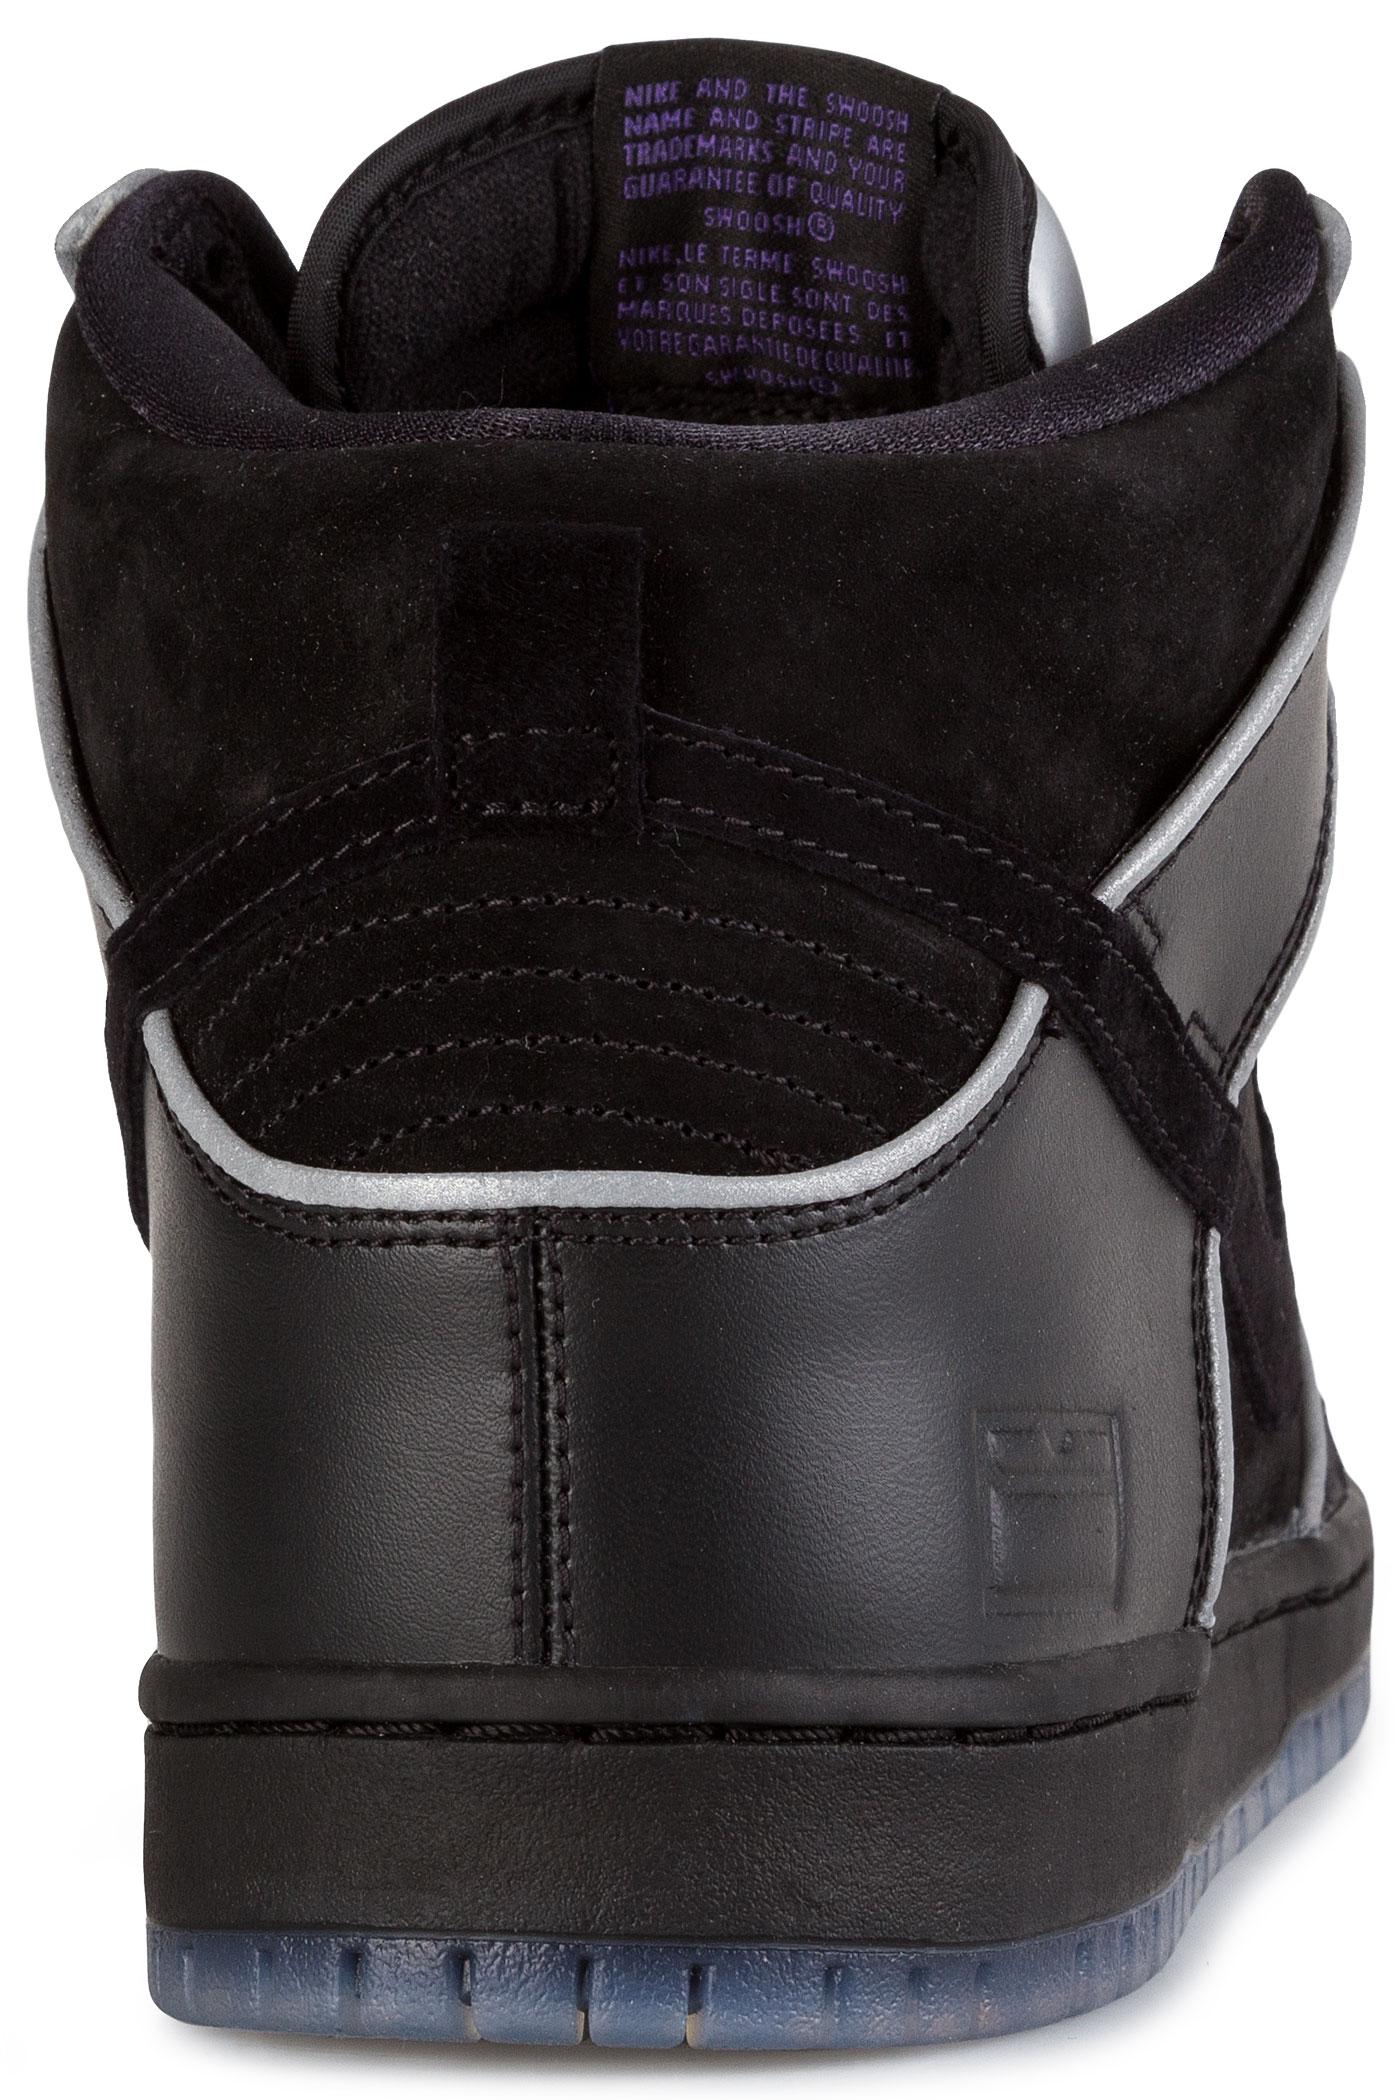 brand new 40556 9cdfd Nike SB Dunk High Elite Shoebox Shoe (black black purple haze)